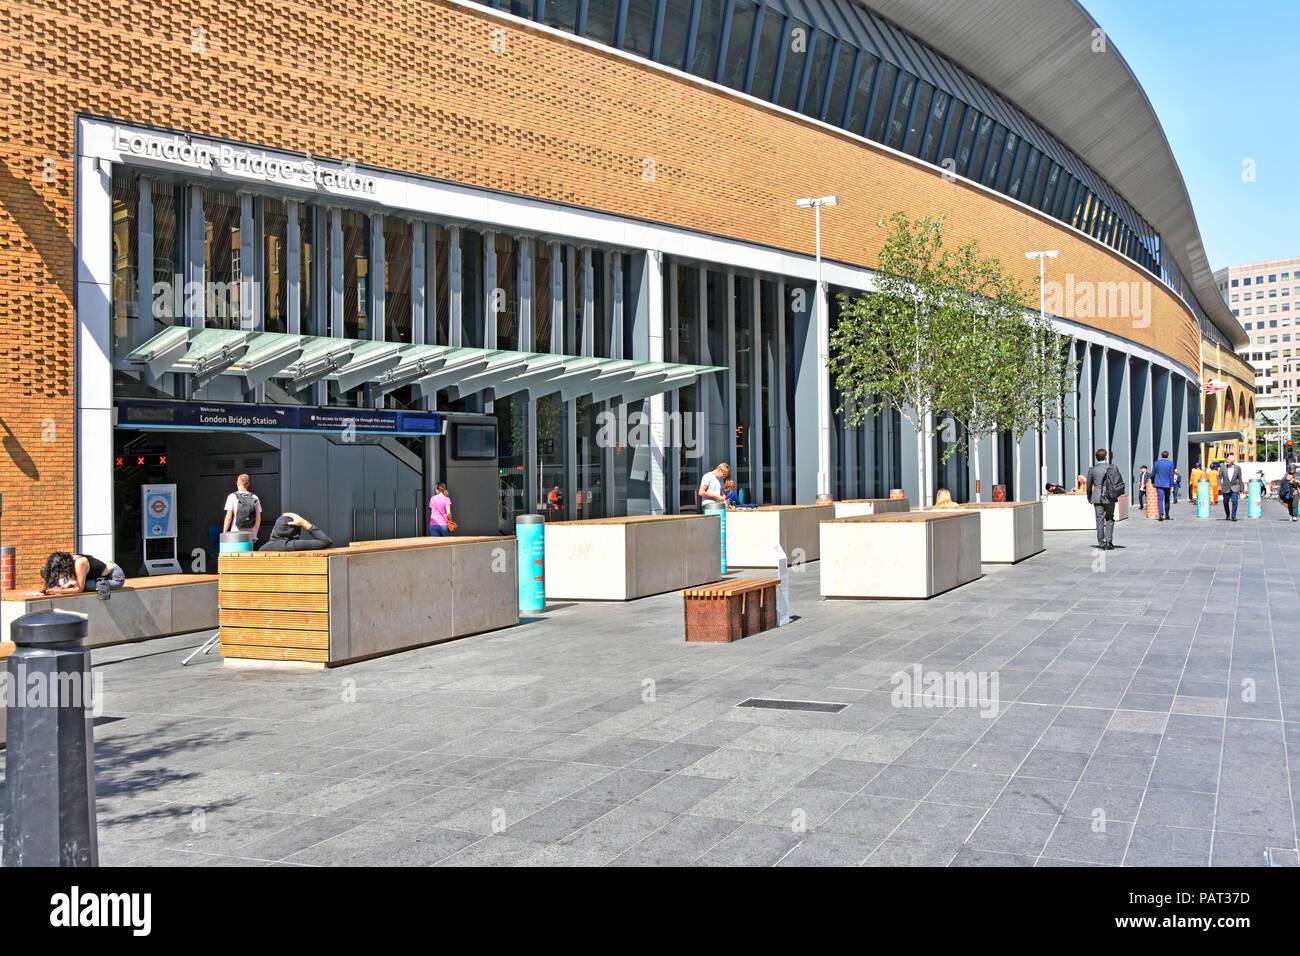 Part of Tooley Street pavement & London Bridge train station facade rebuilt in public transport infrastructure project Southwark London England UK - Stock Image